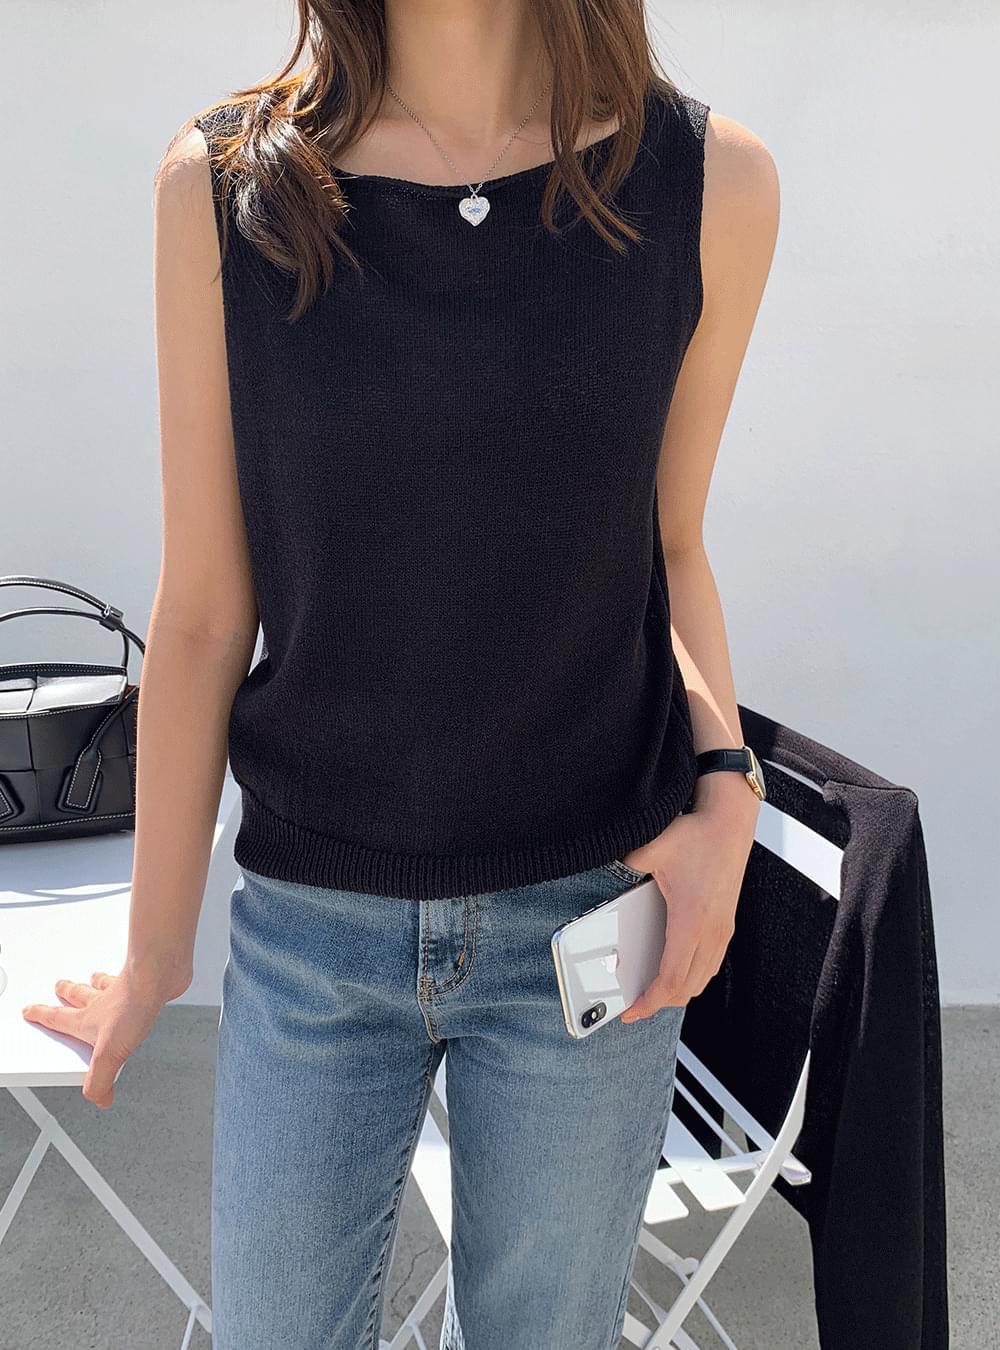 《Planned Product》 Summer Linen Lip Neck Knitwear Top